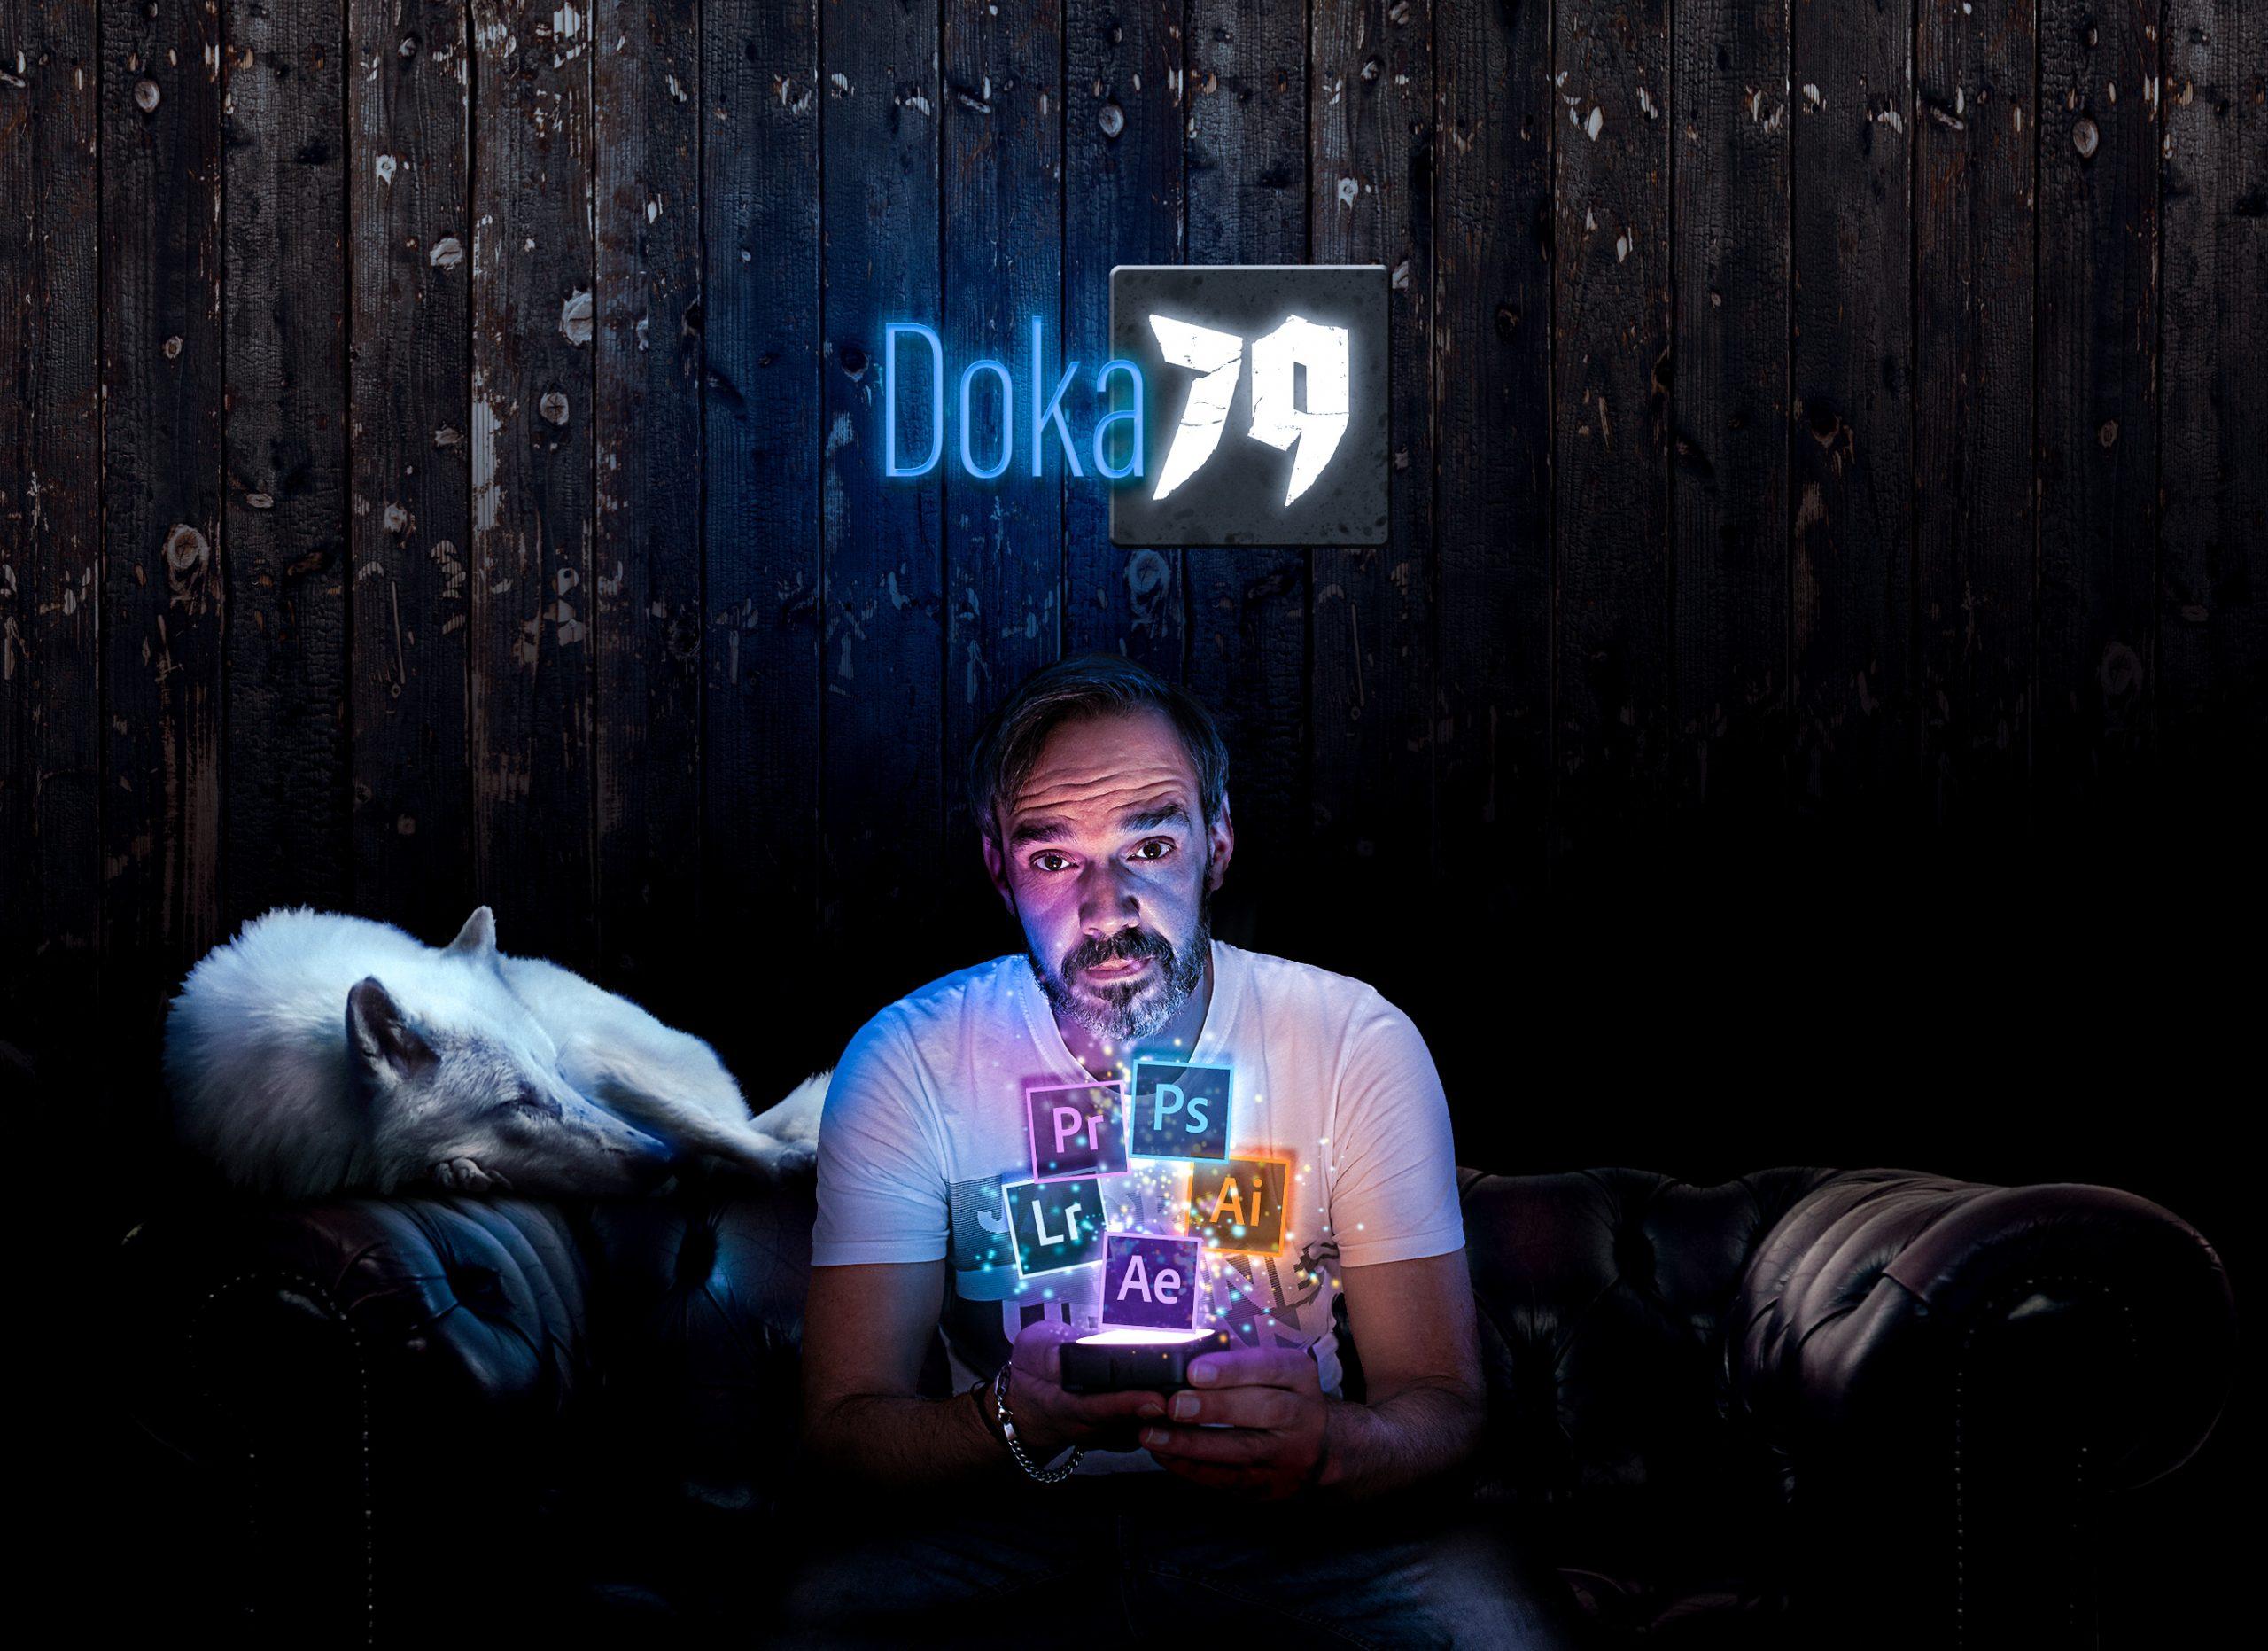 doka79-Photoshop-Artwork-000